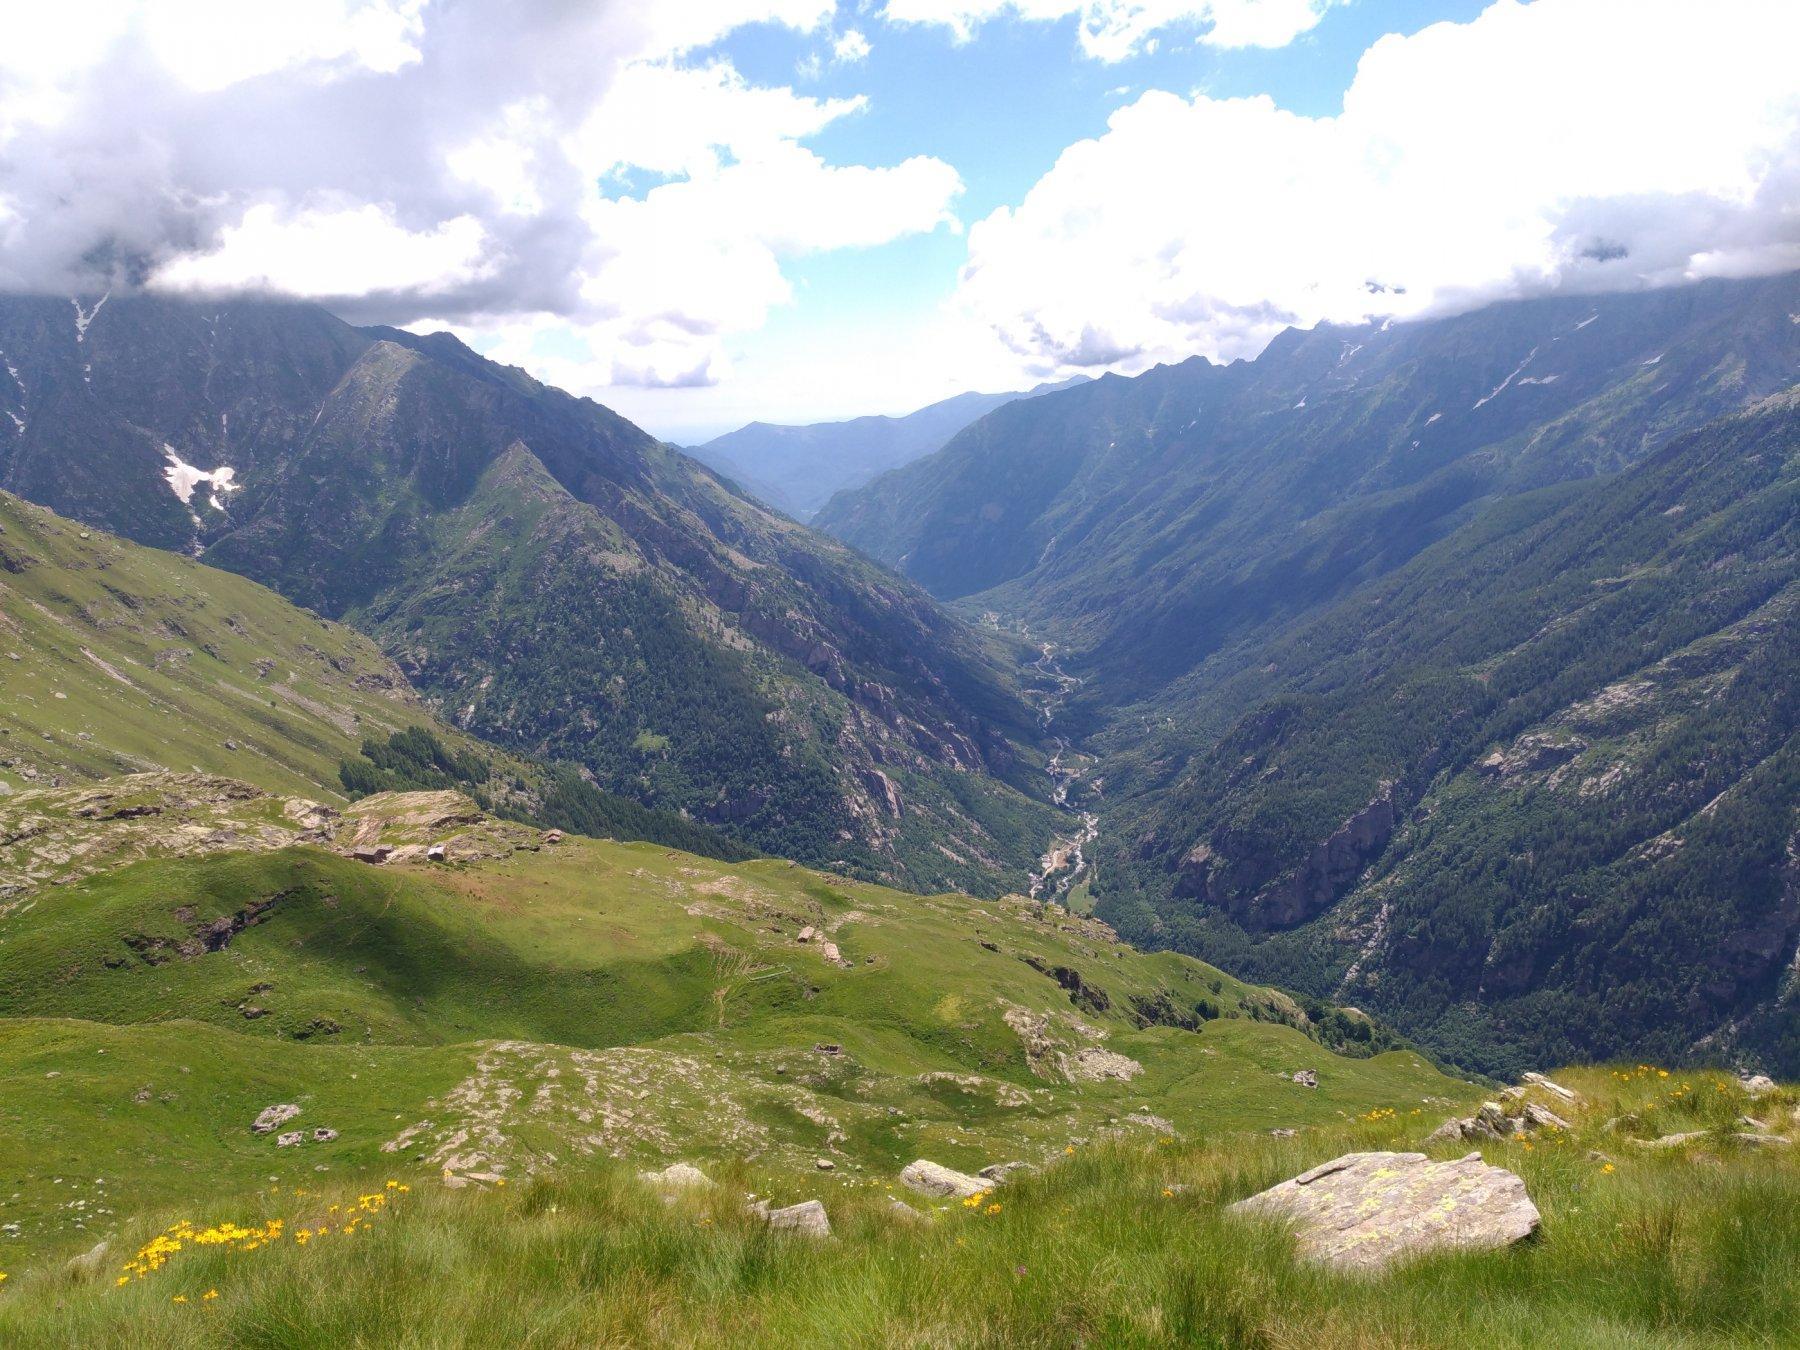 Vista della valle Orco arrivando al Gran Piano